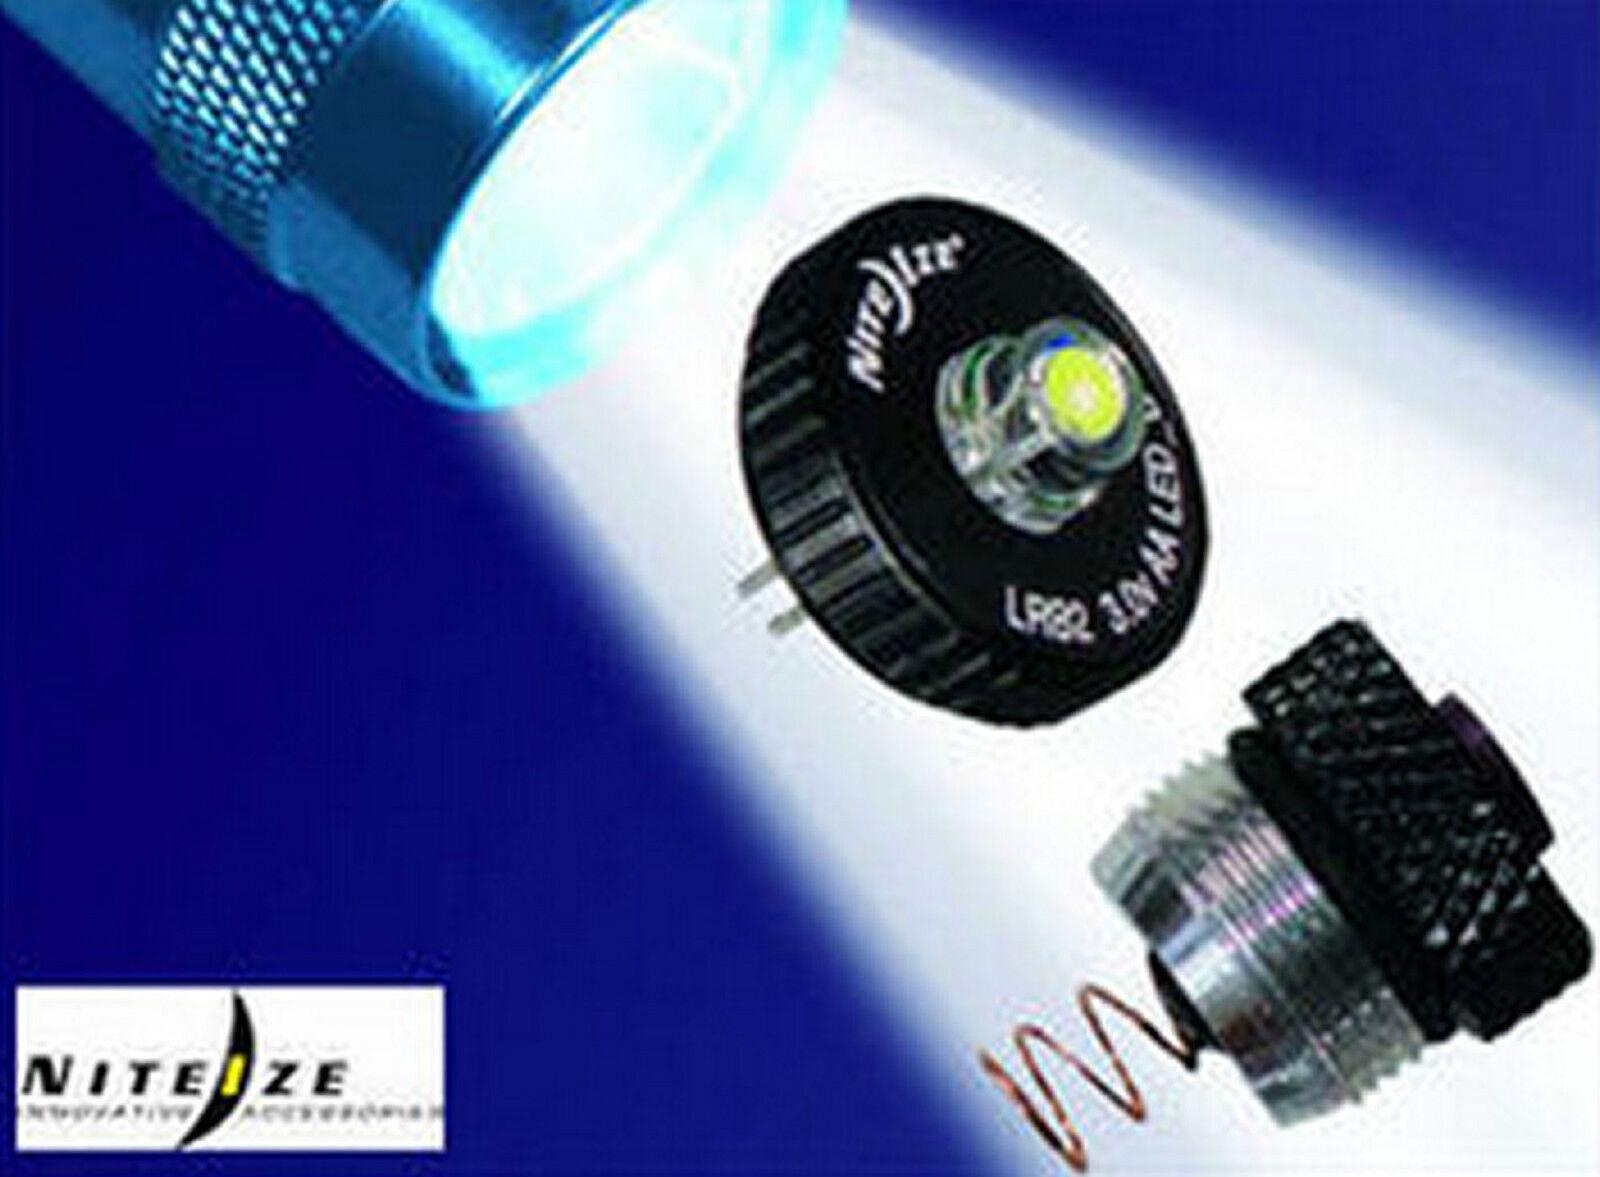 Nite Ize MAGLIGHT Torche Torche Torche LED Lumière Combo 2 Upgrade Kit convertisseur AA blanc luc207 1af27b